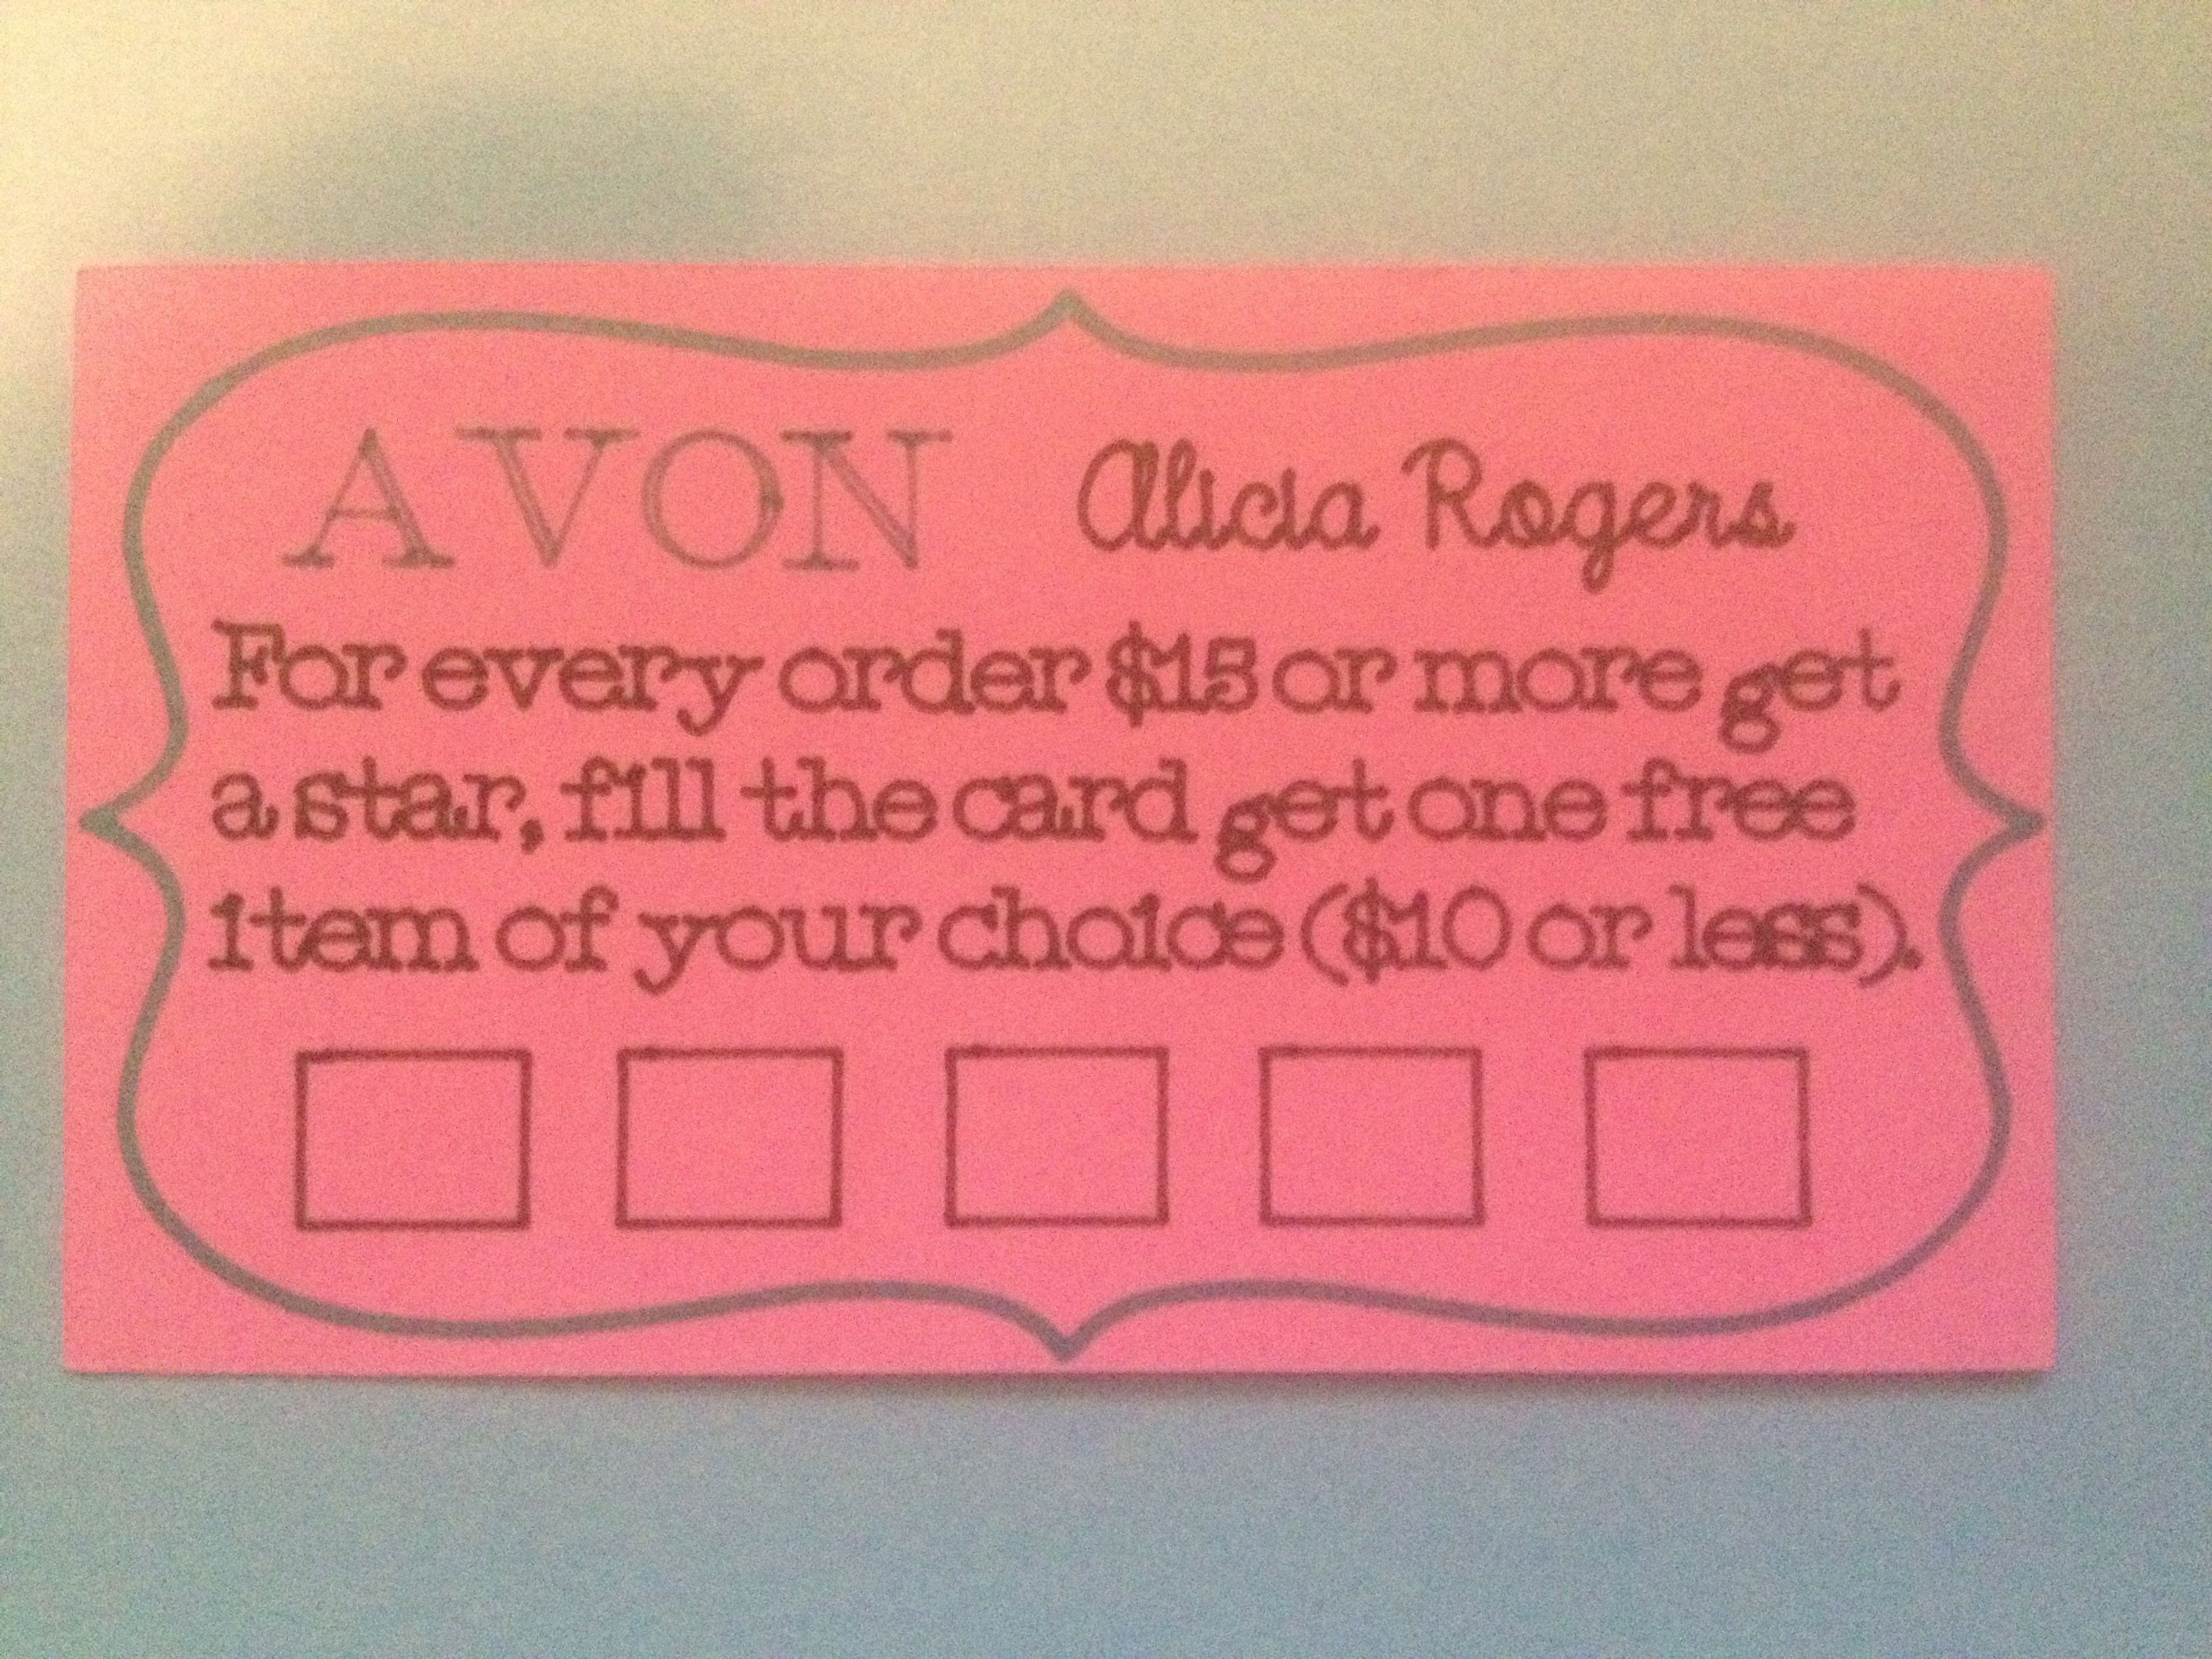 Avon loyalty card. Youravon.com/aliciarogers #cricut | Avon ...